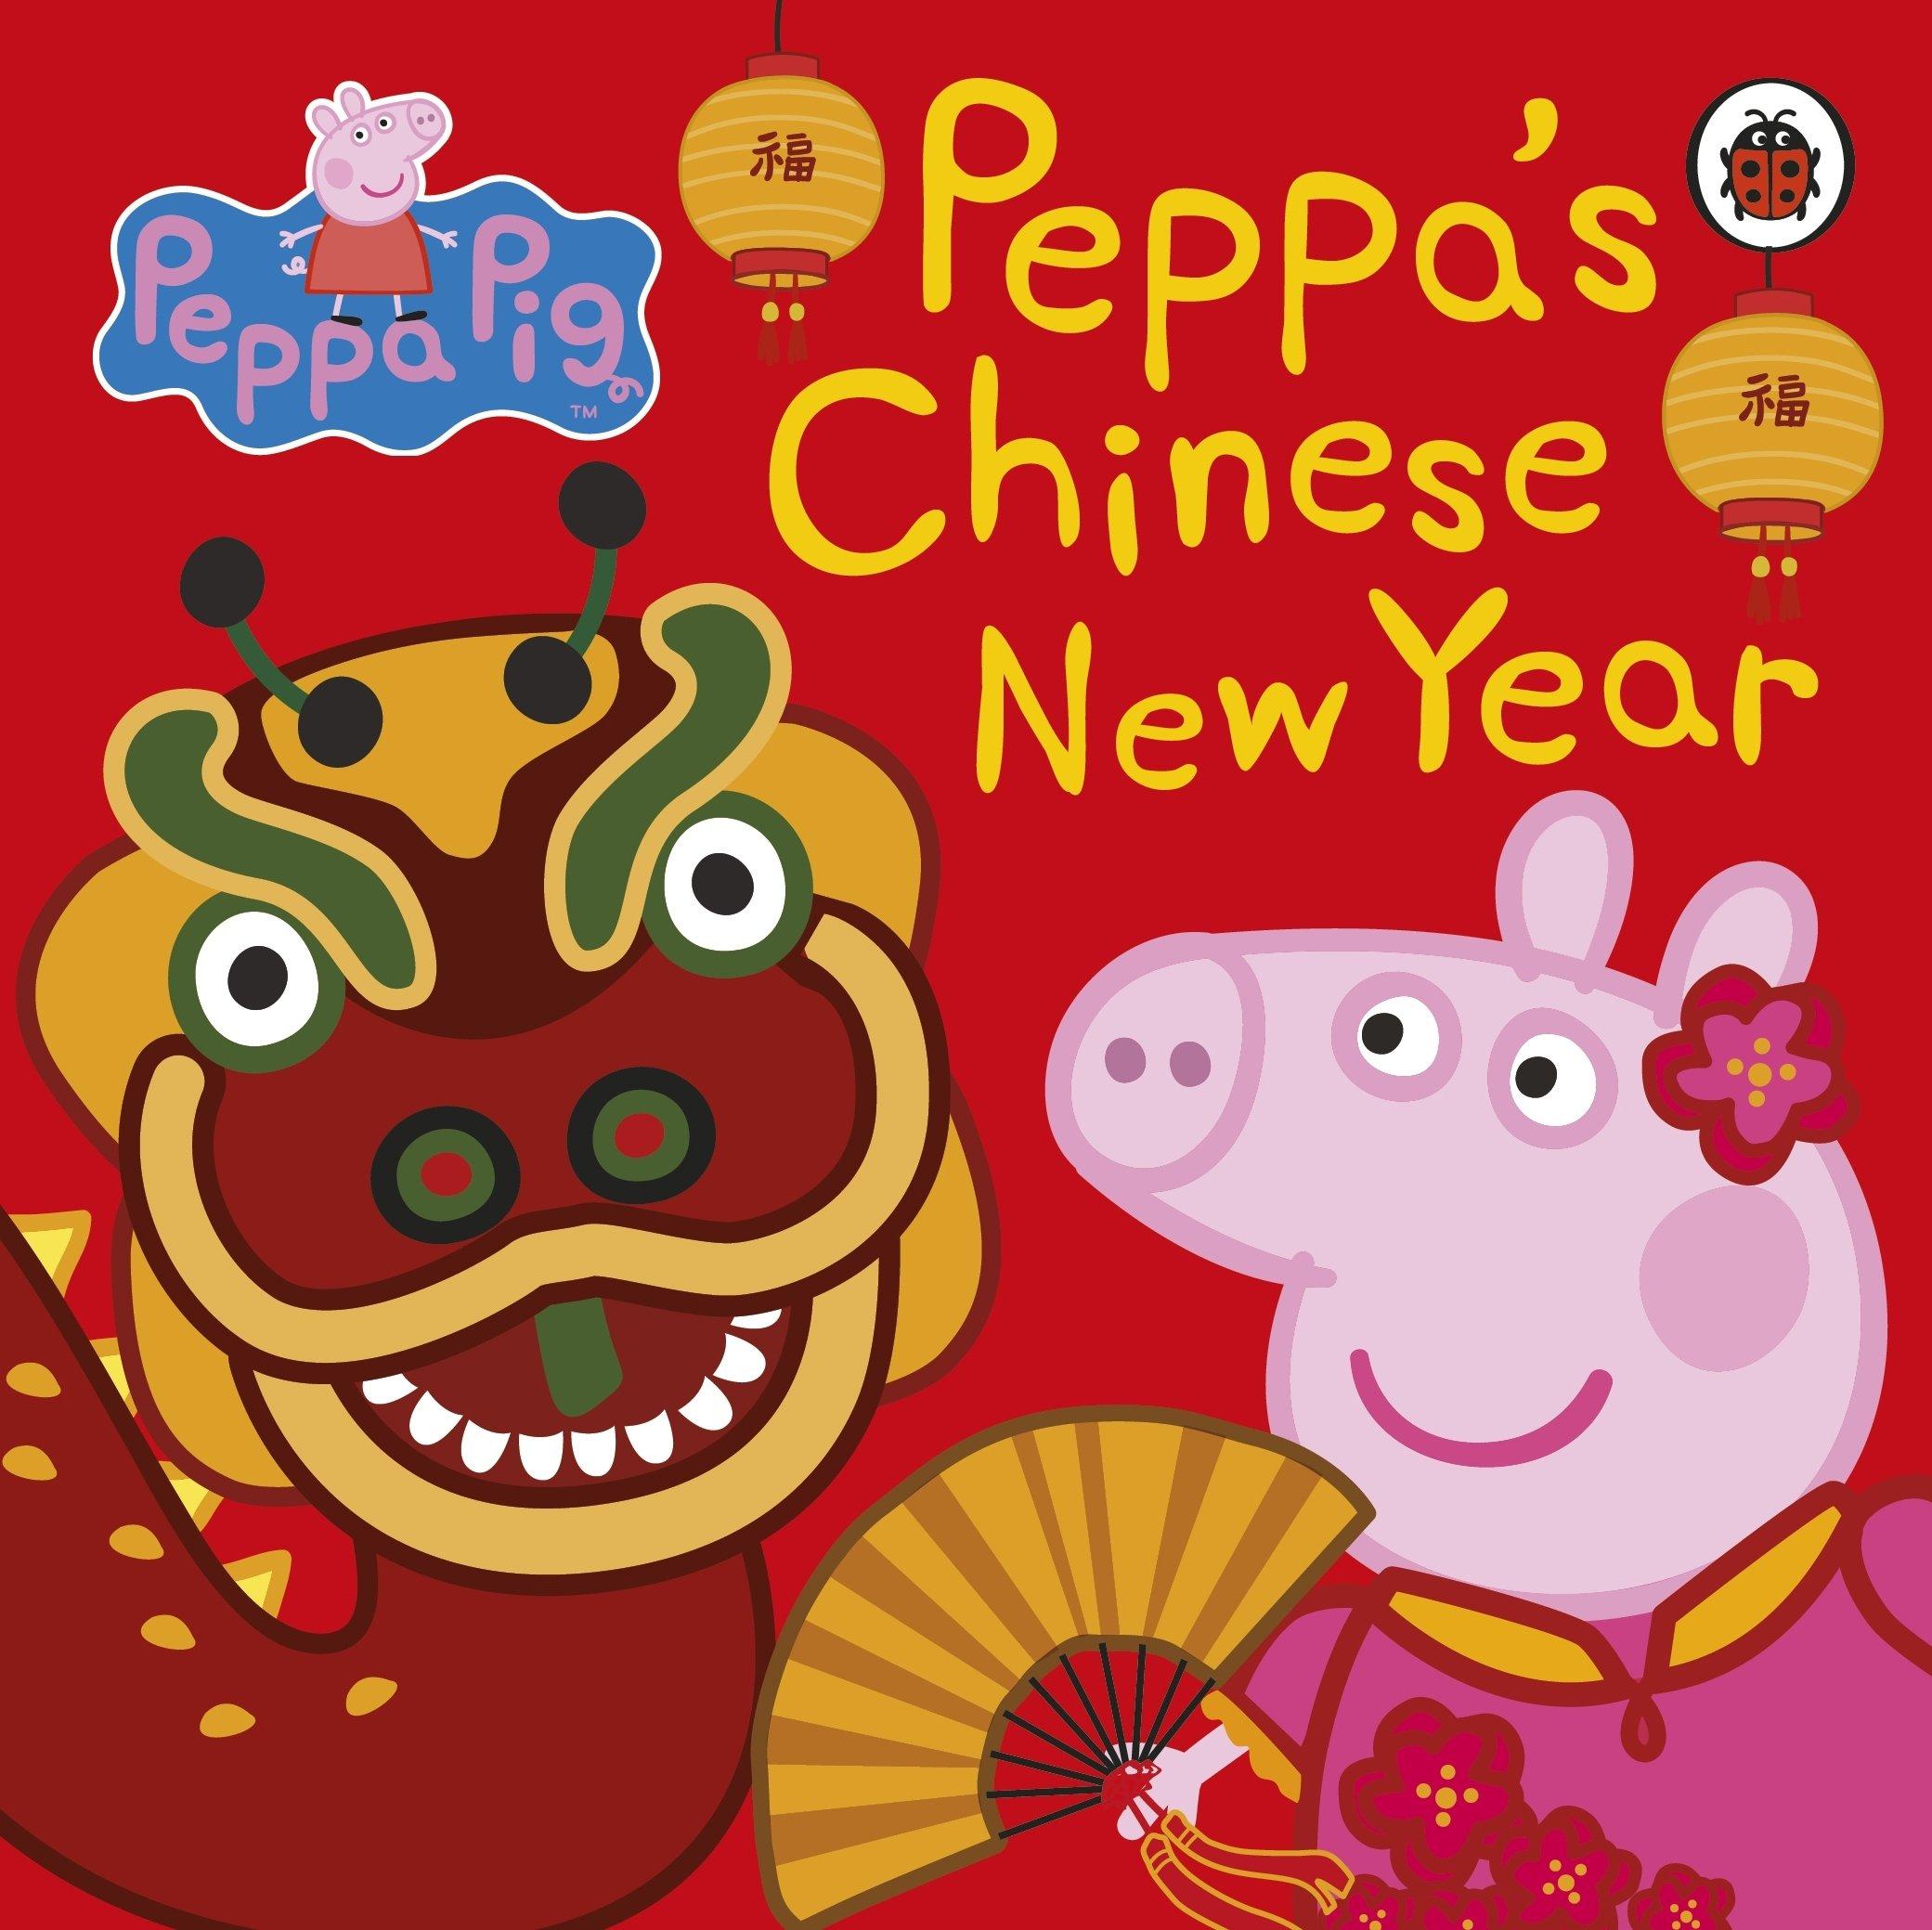 b9c8ab4e5 Peppa Pig: Chinese New Year: Amazon.co.uk: Peppa Pig: Books